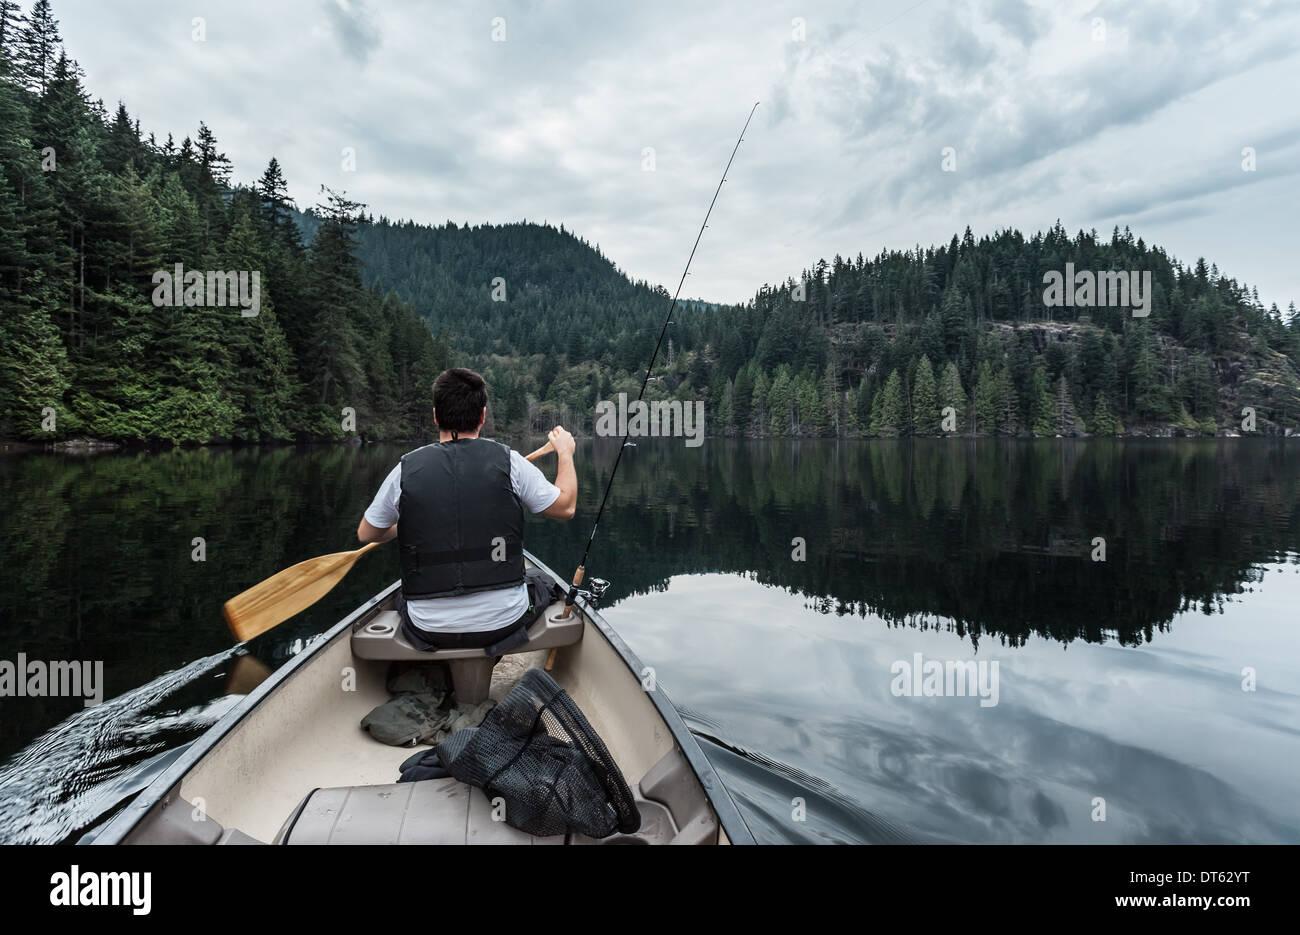 Giovane uomo pesca Lago Buntzen, British Columbia, Canada Immagini Stock